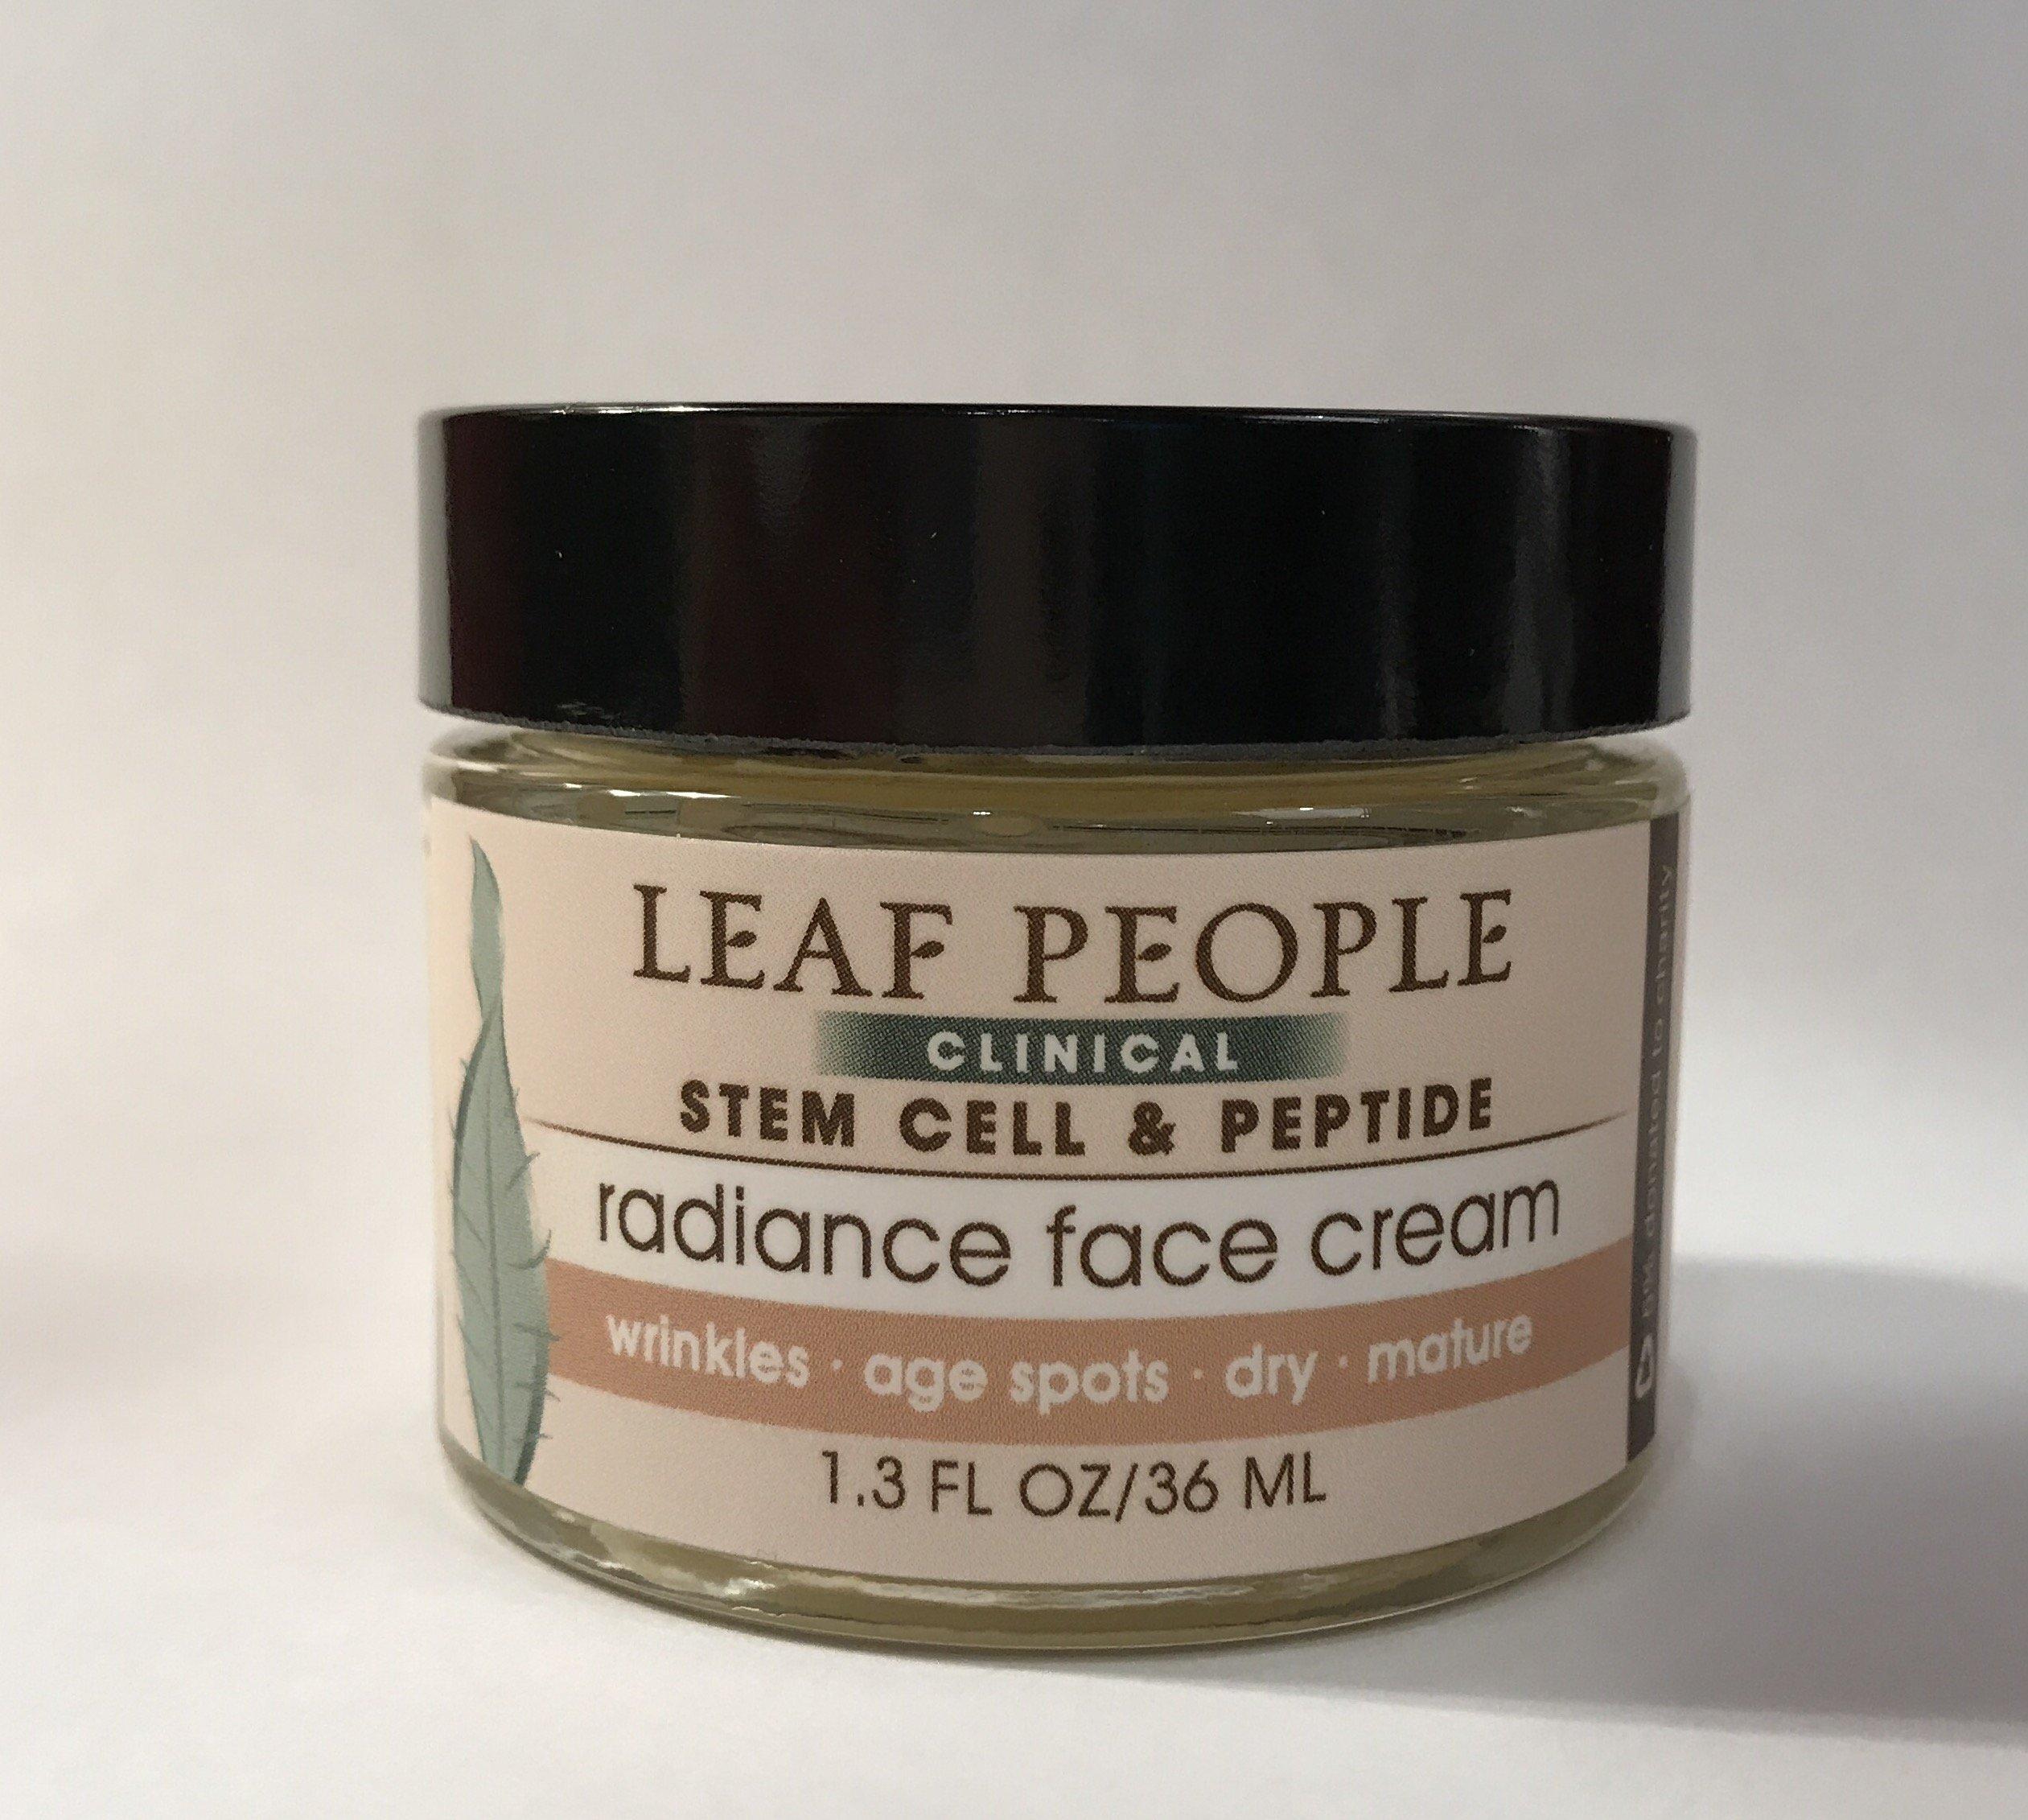 Stem Cell & Peptide Radiance Face Cream 1.3 oz.